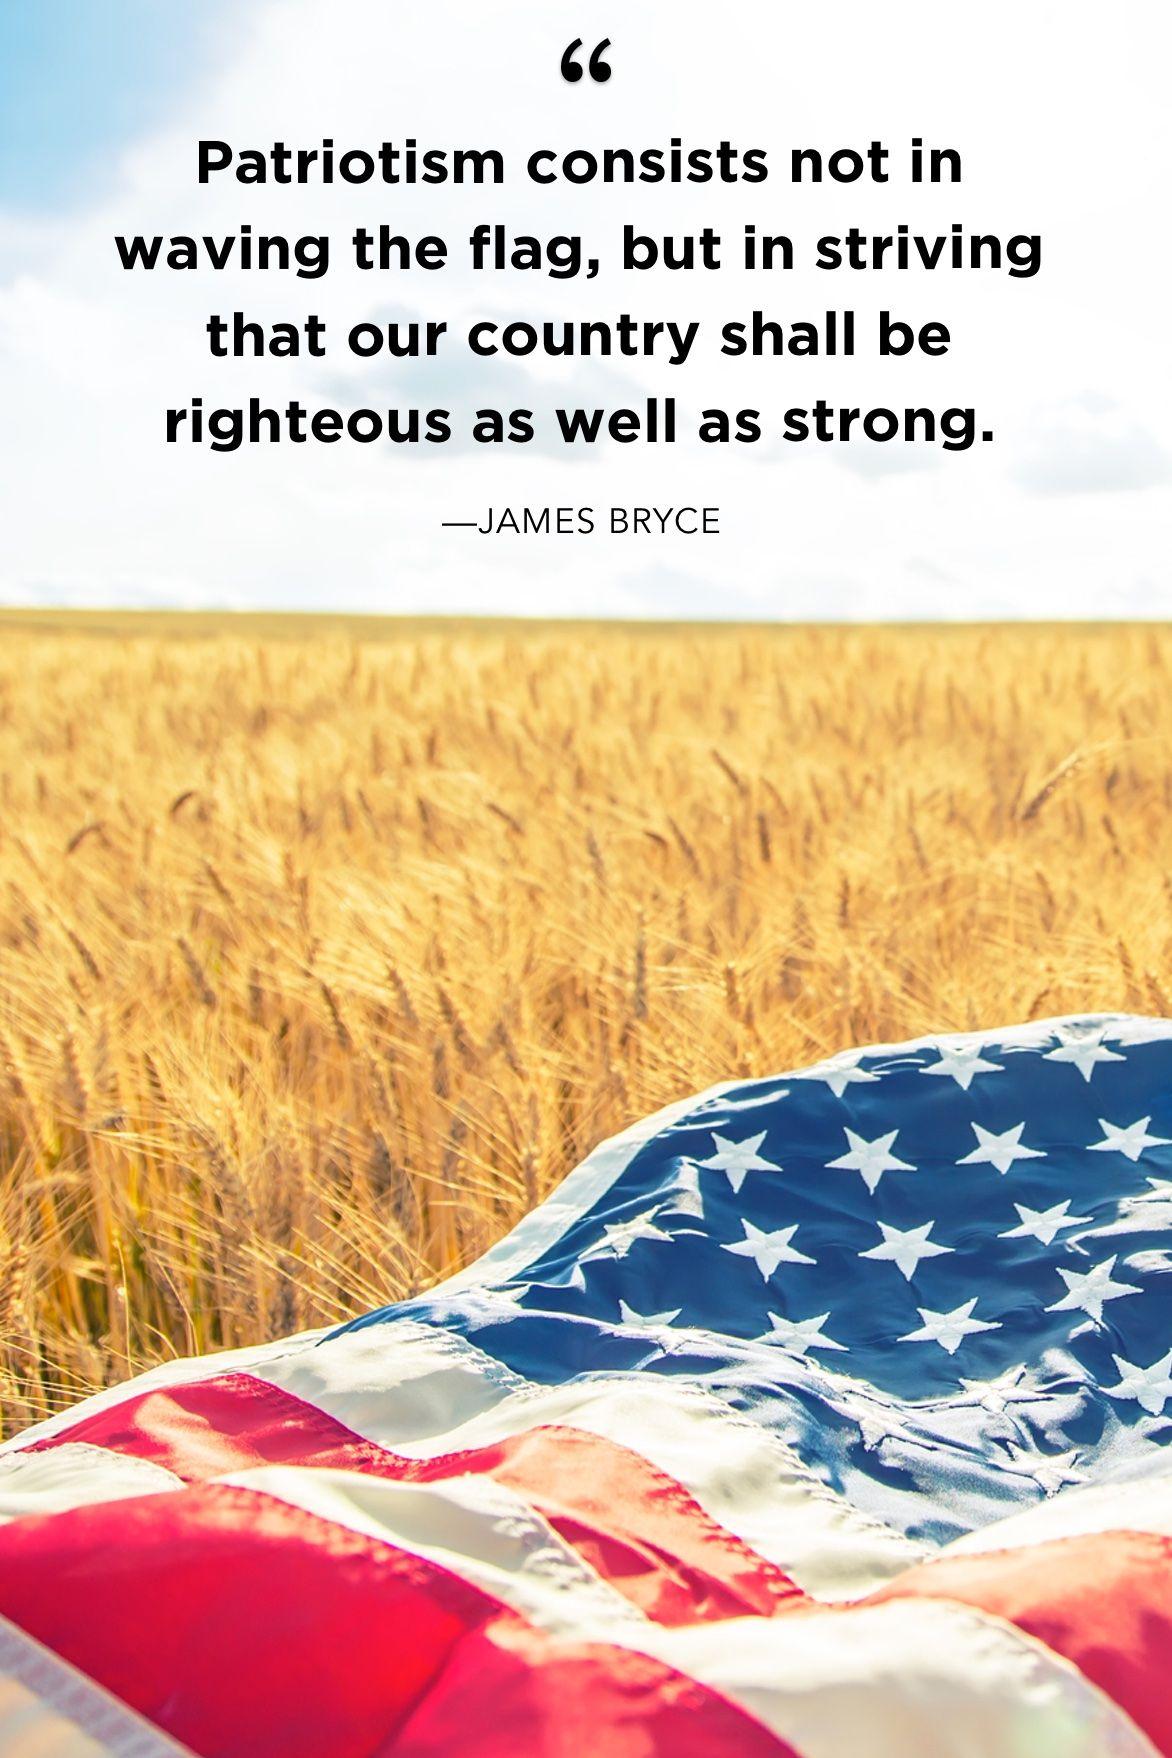 Quotations About Patriotism : quotations, about, patriotism, Patriotic, Quotes, Memorial